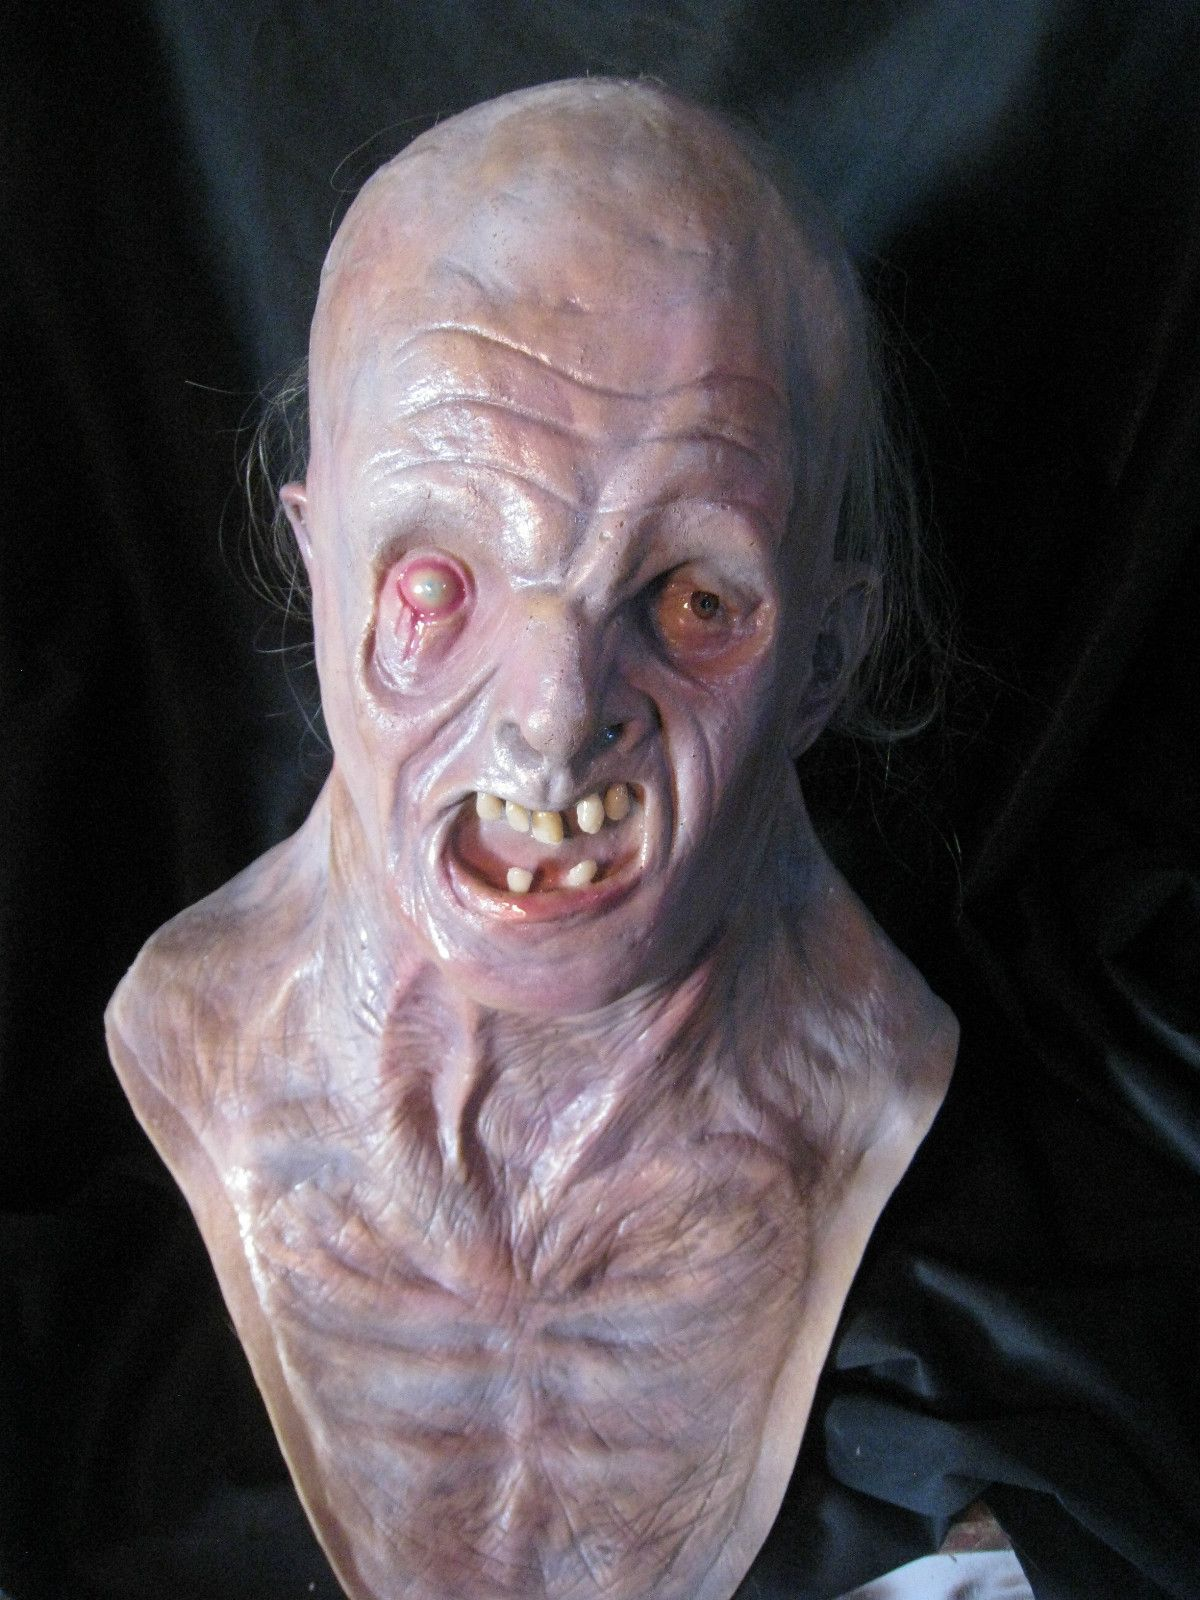 Jason Voorhees remake lifesize latex mask prop not freddy krueger ...